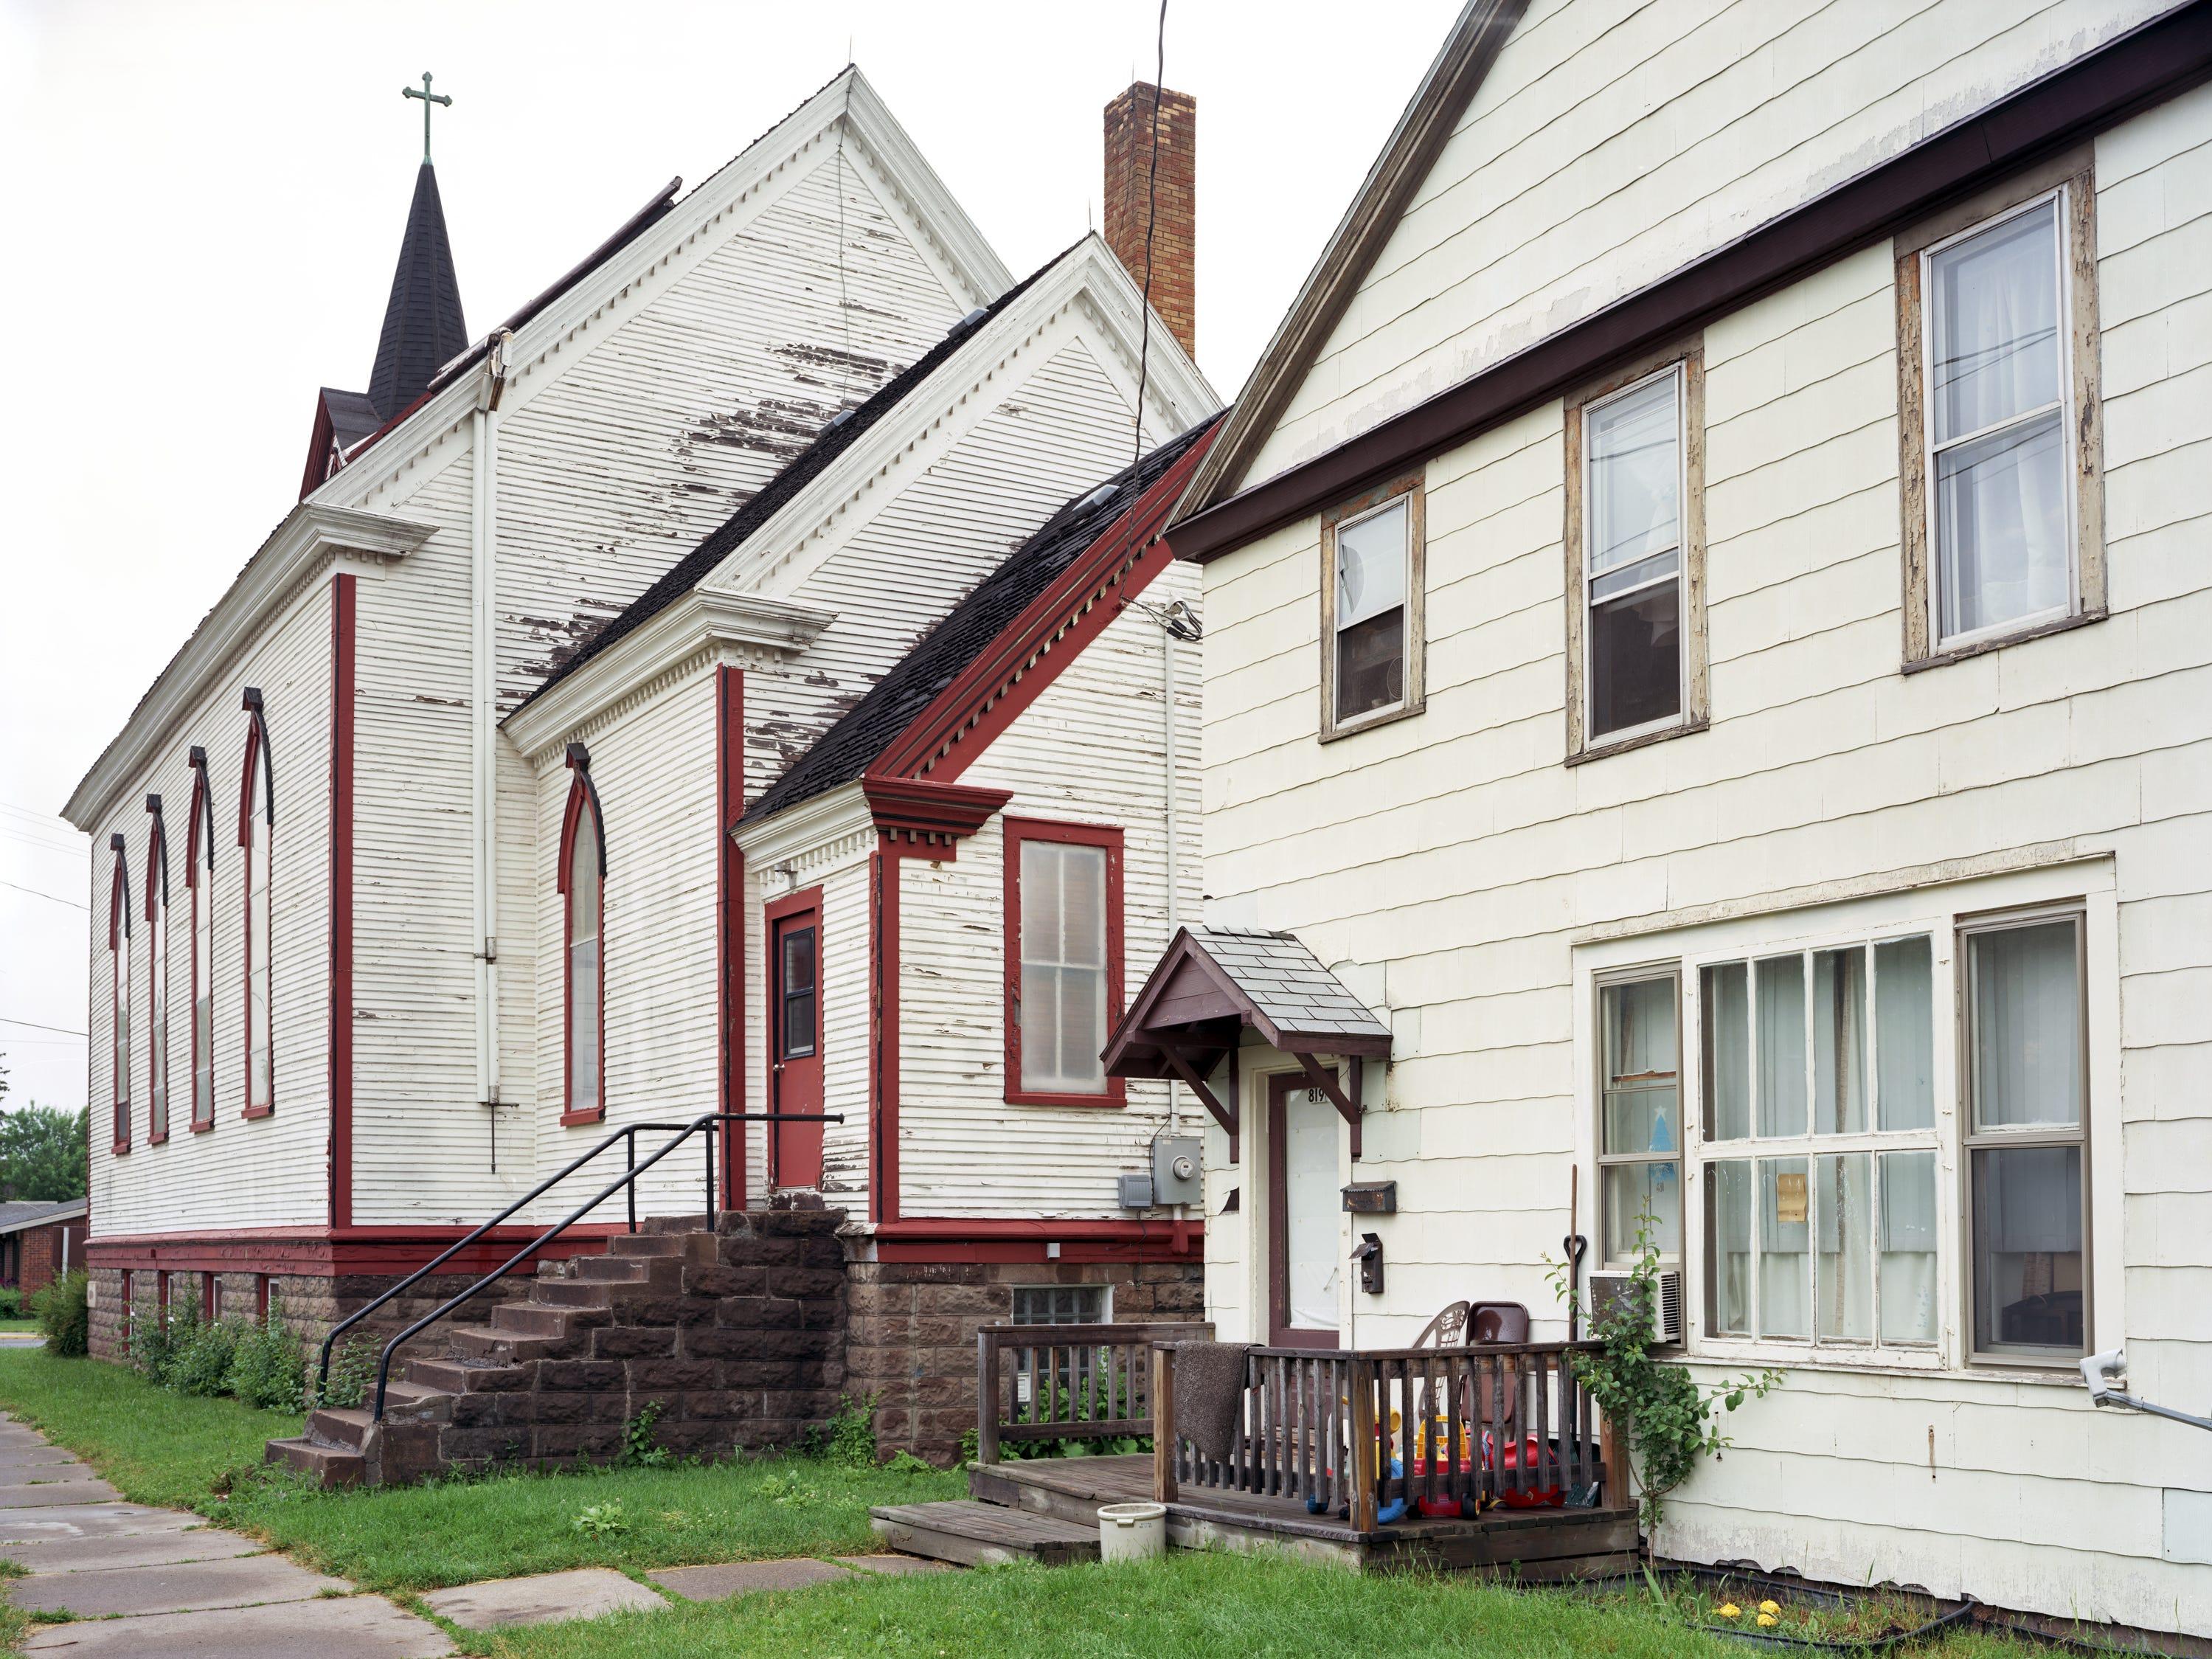 Third Street, Ashland. July 2013